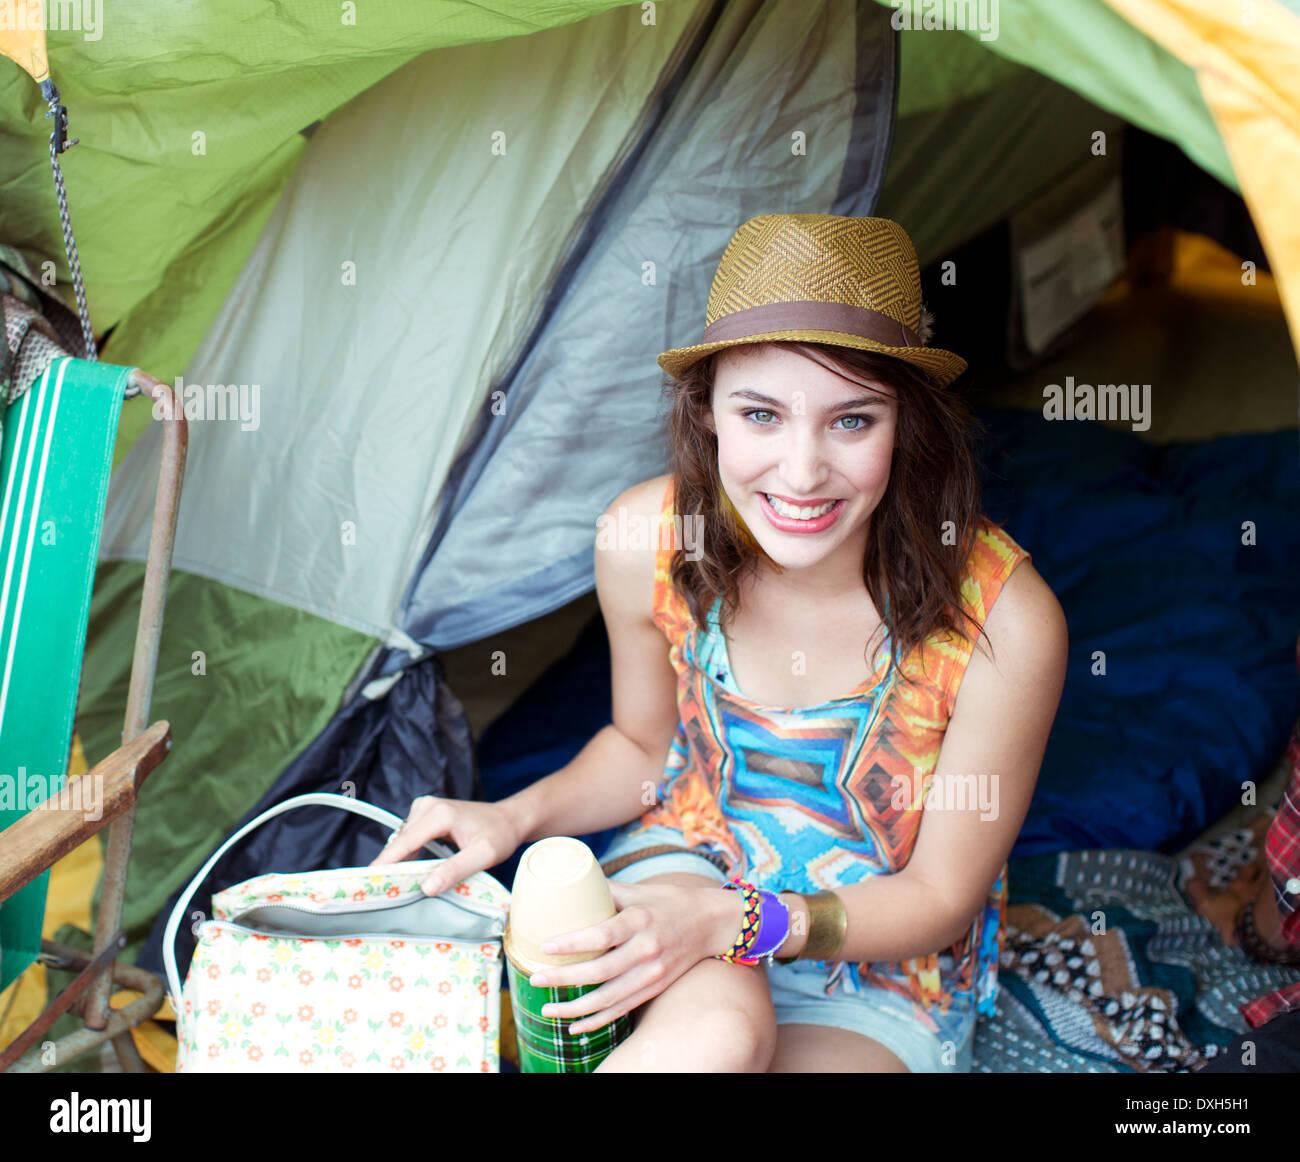 Porträt der lächelnde Frau im Zelt beim Musikfestival Stockbild